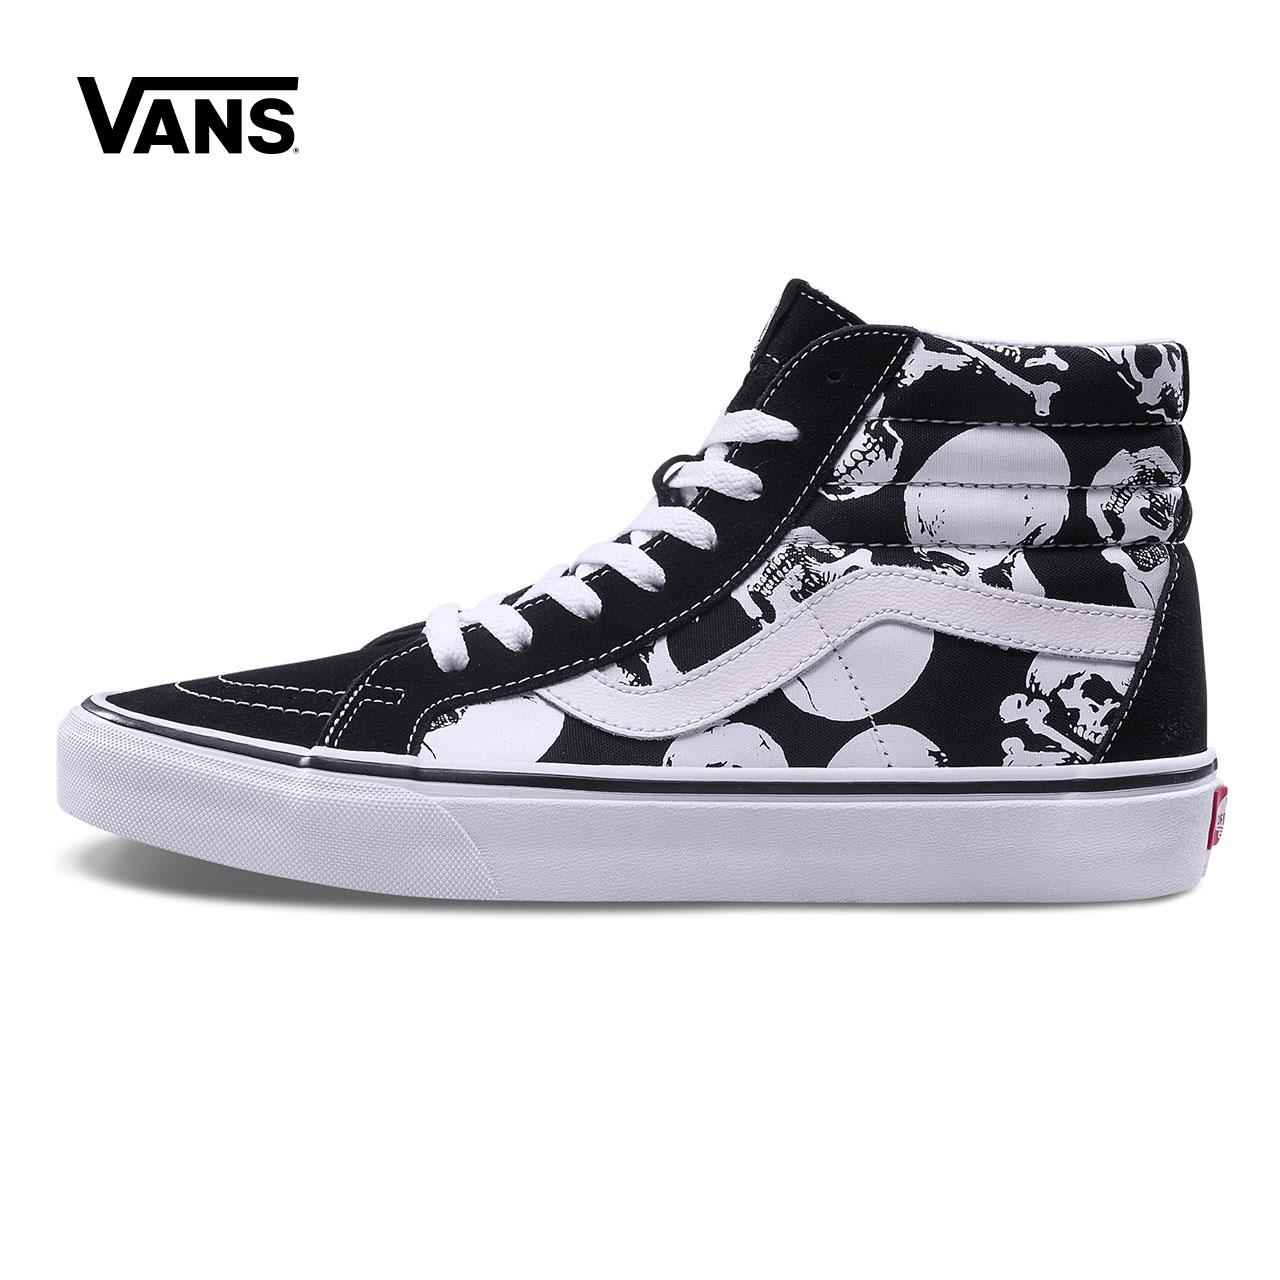 Vans 范斯官方男女款SK8-HI板鞋 VN0A2XSBH0B